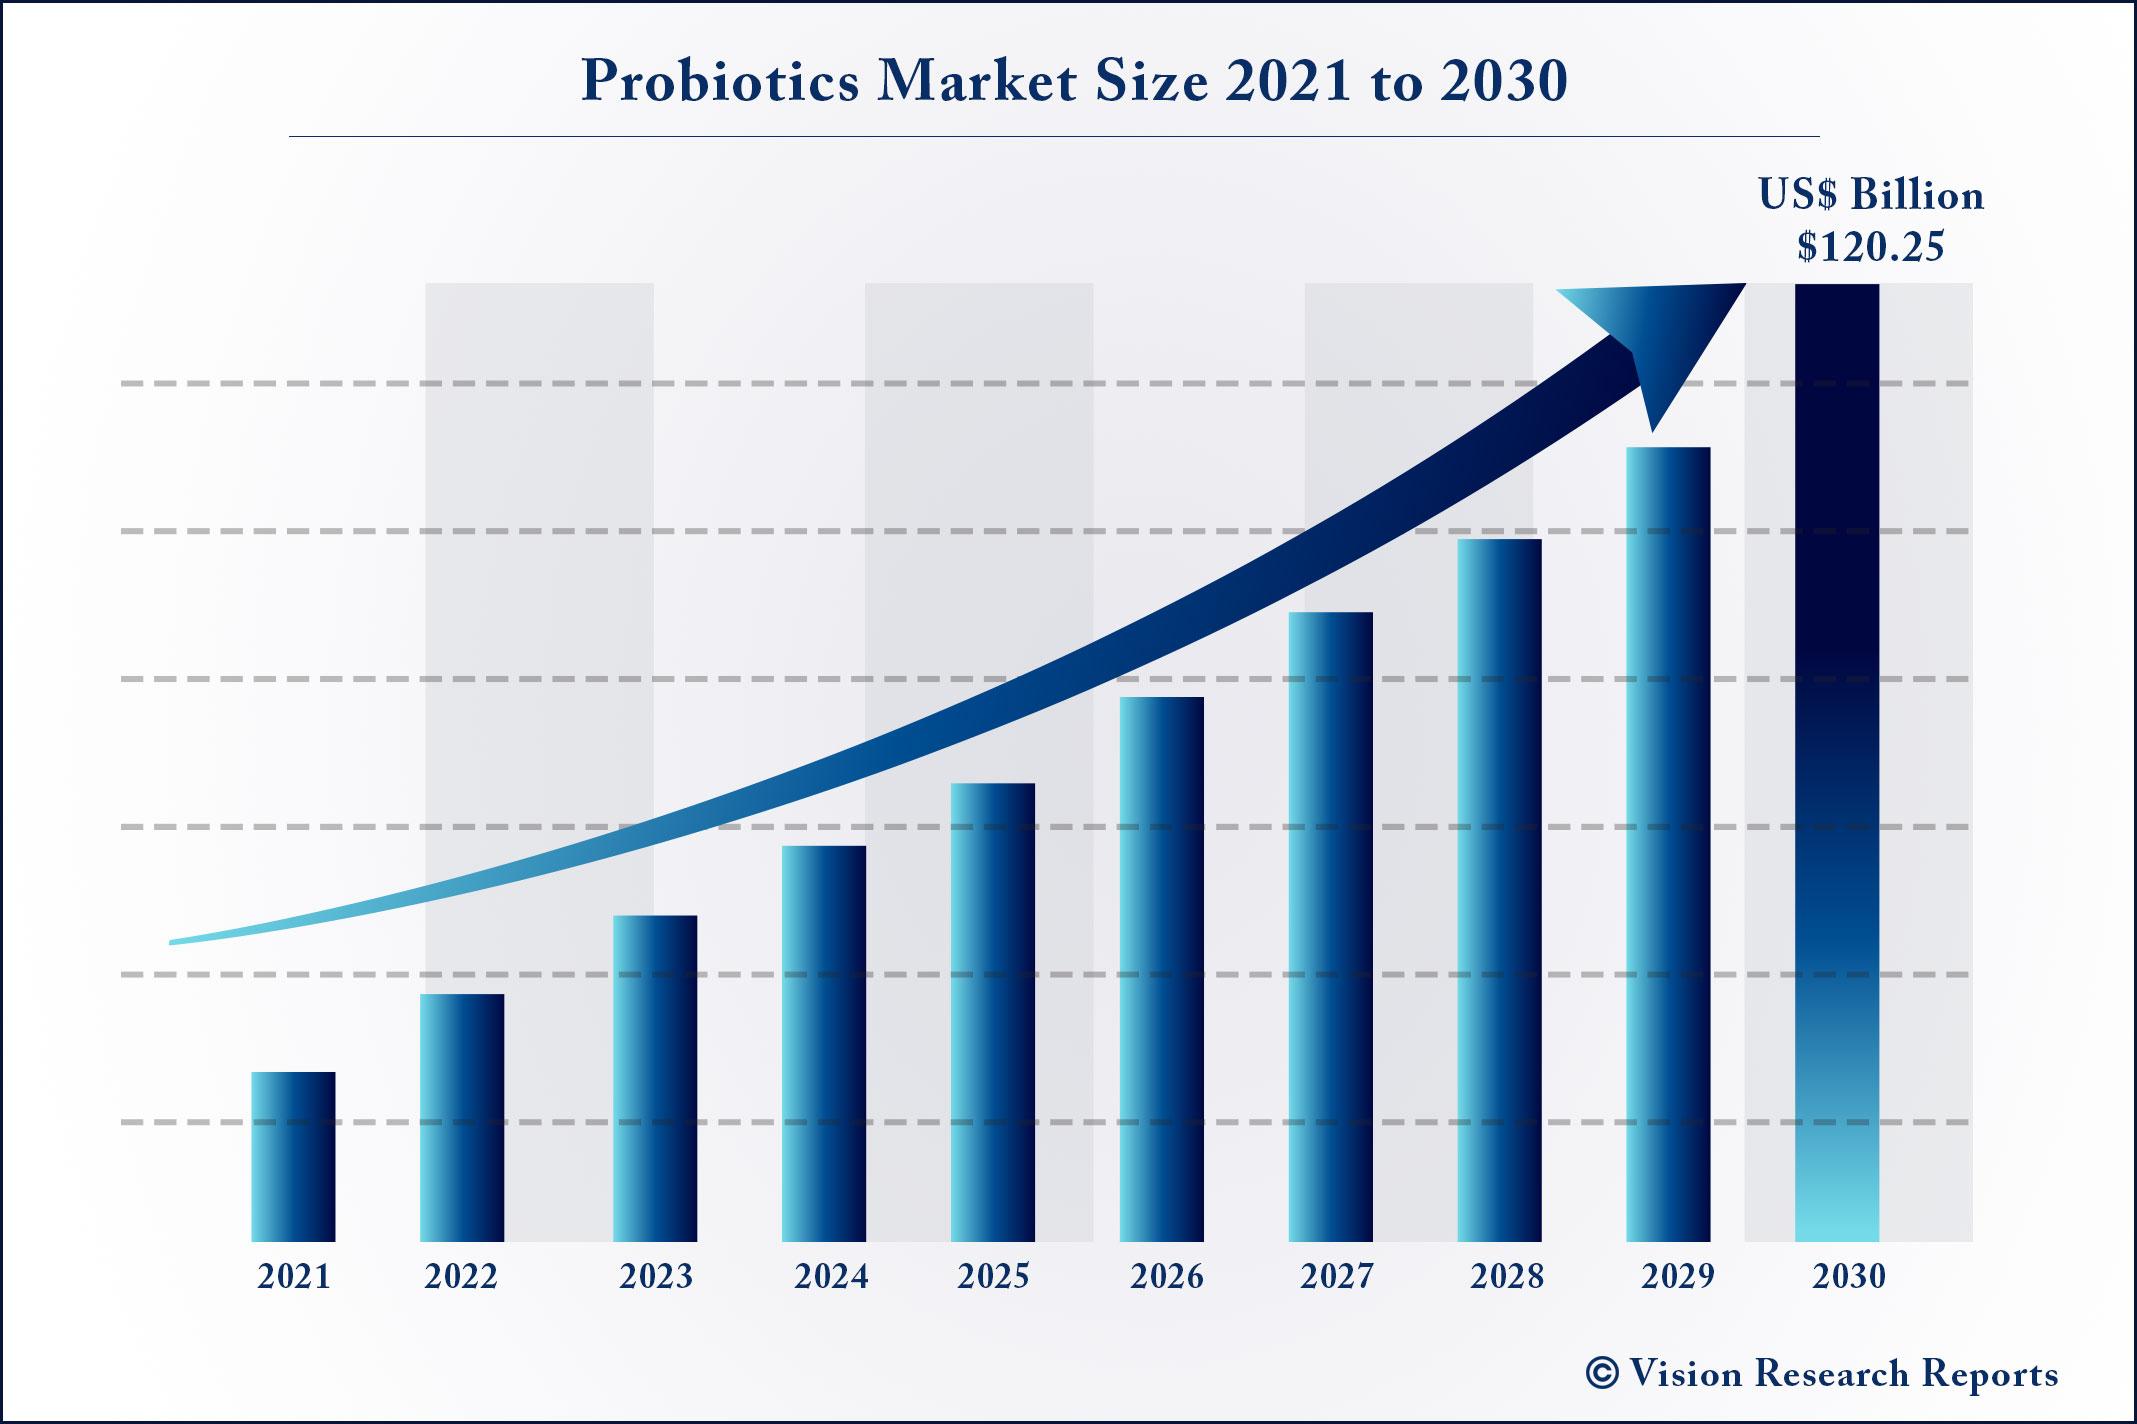 Probiotics Market Size 2021 to 2030